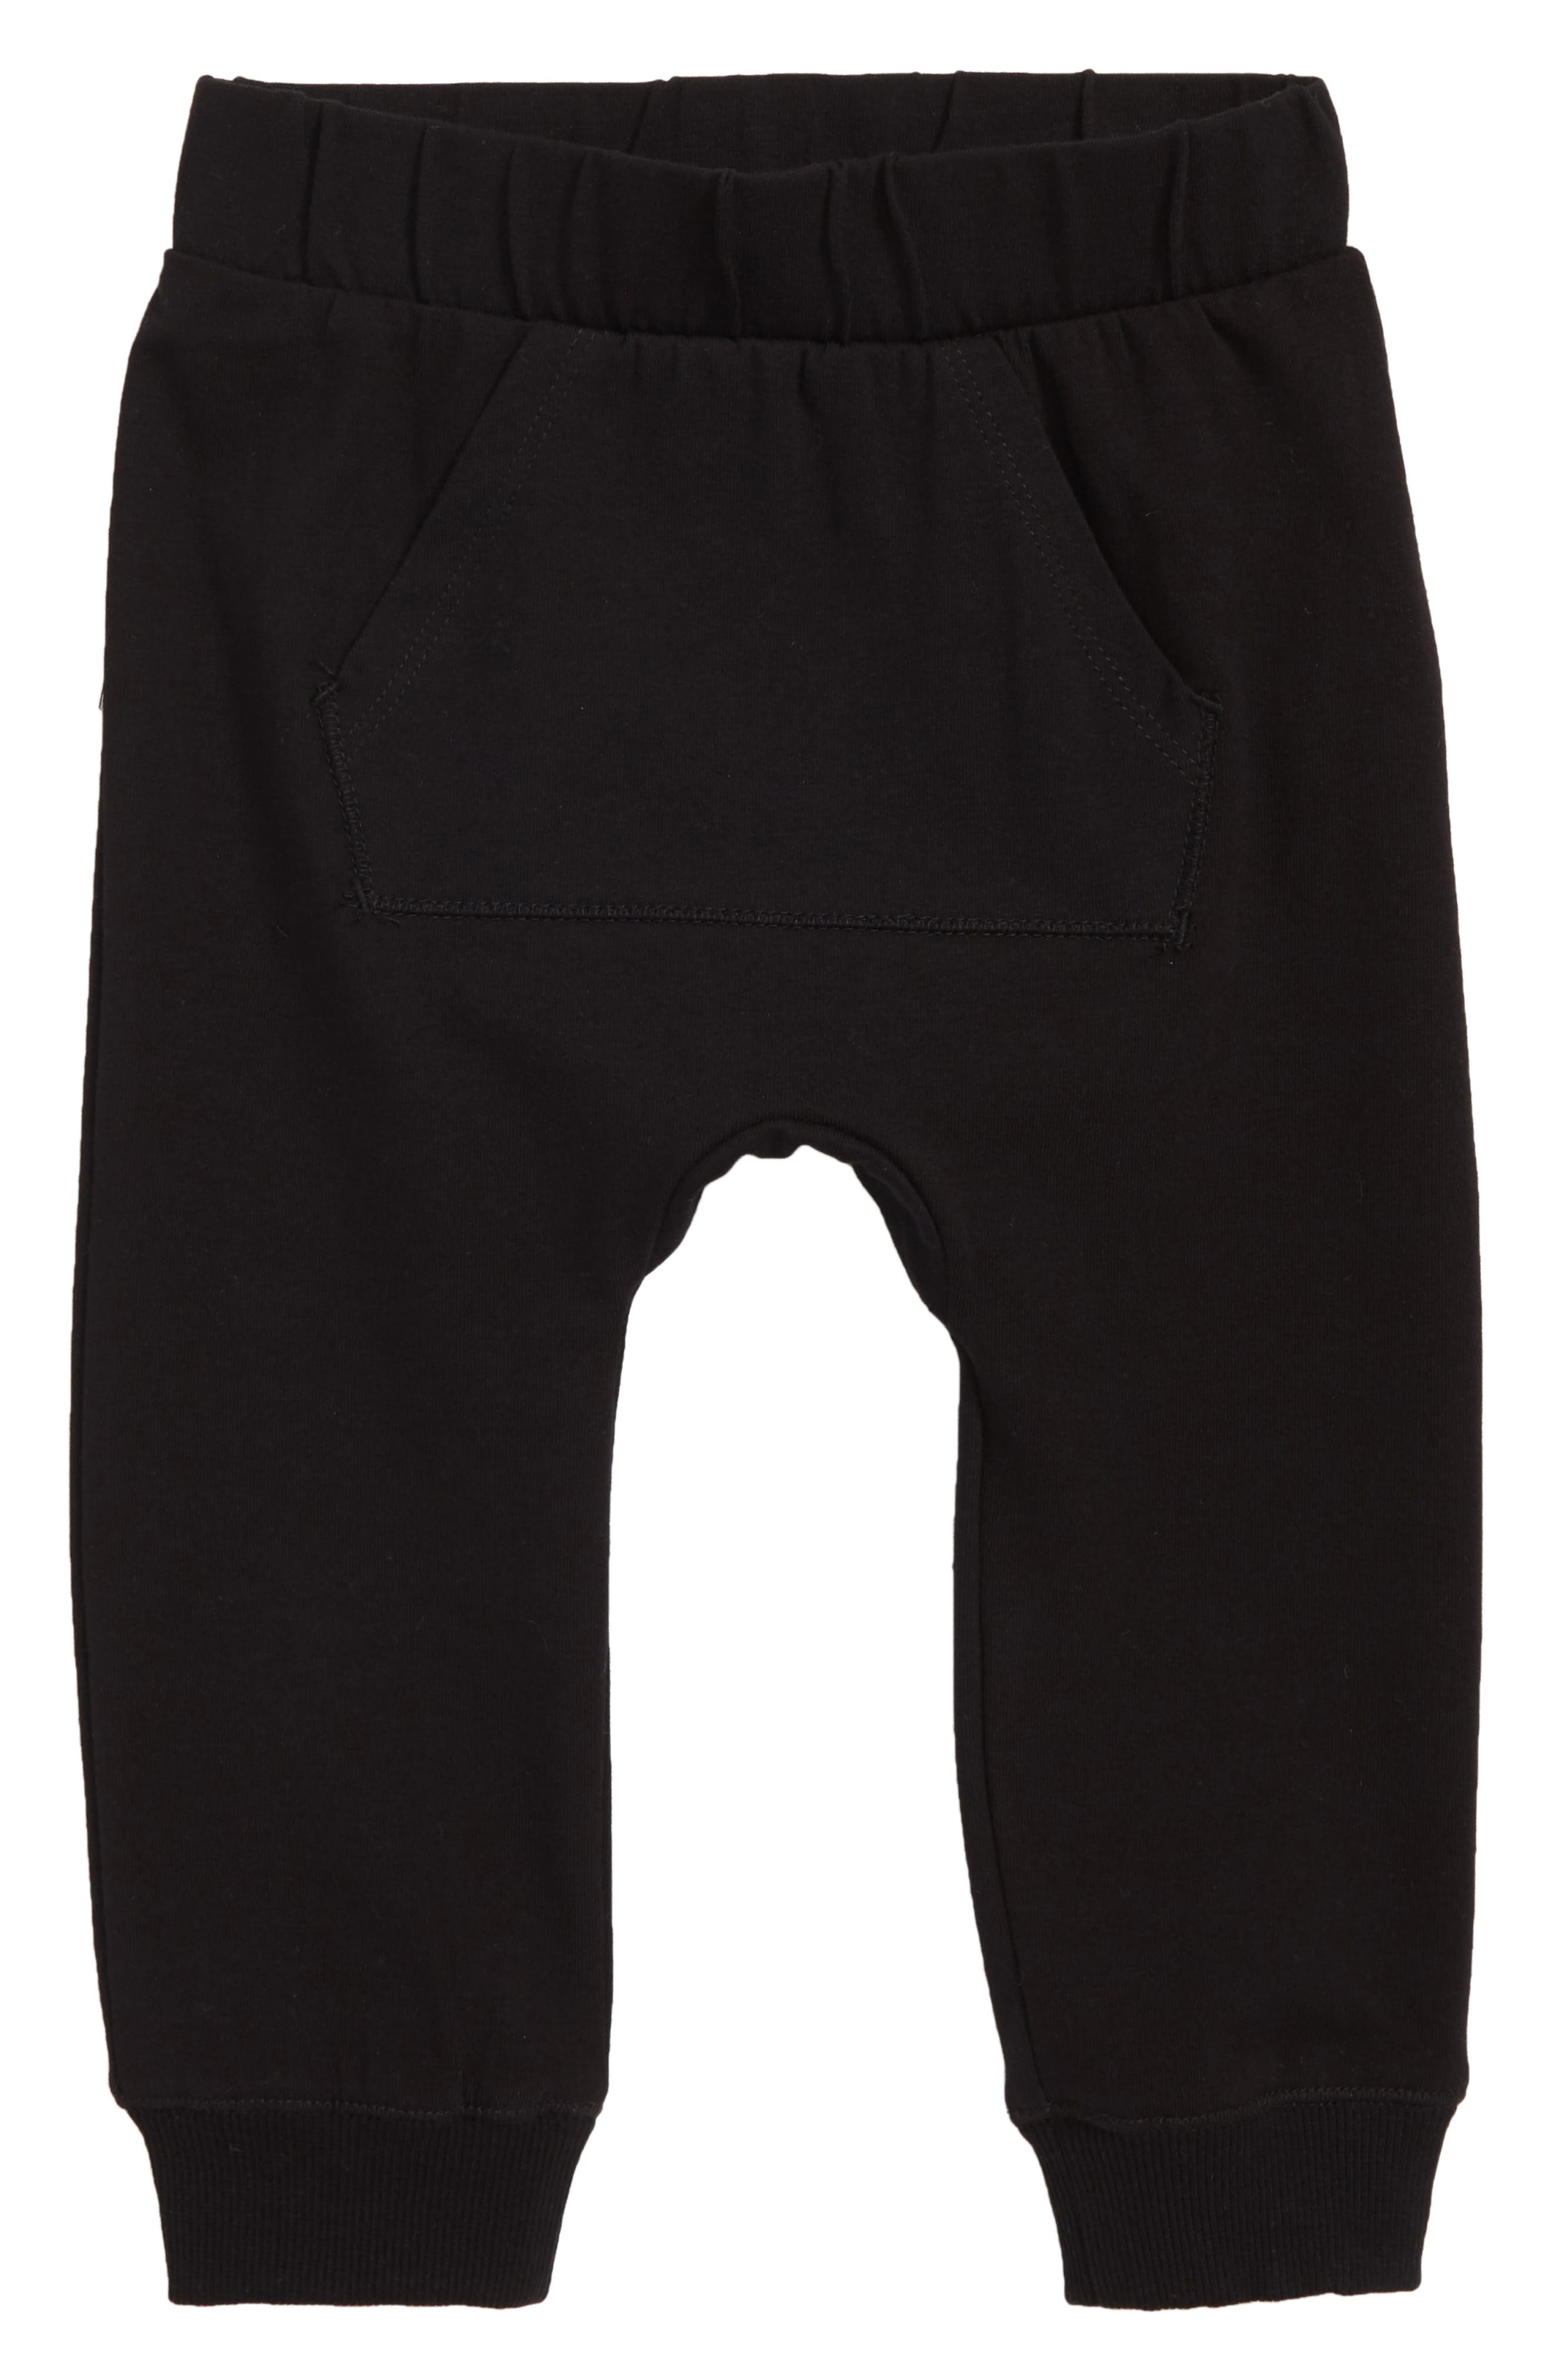 MILES BABY Jogger Pants, Main, color, 001